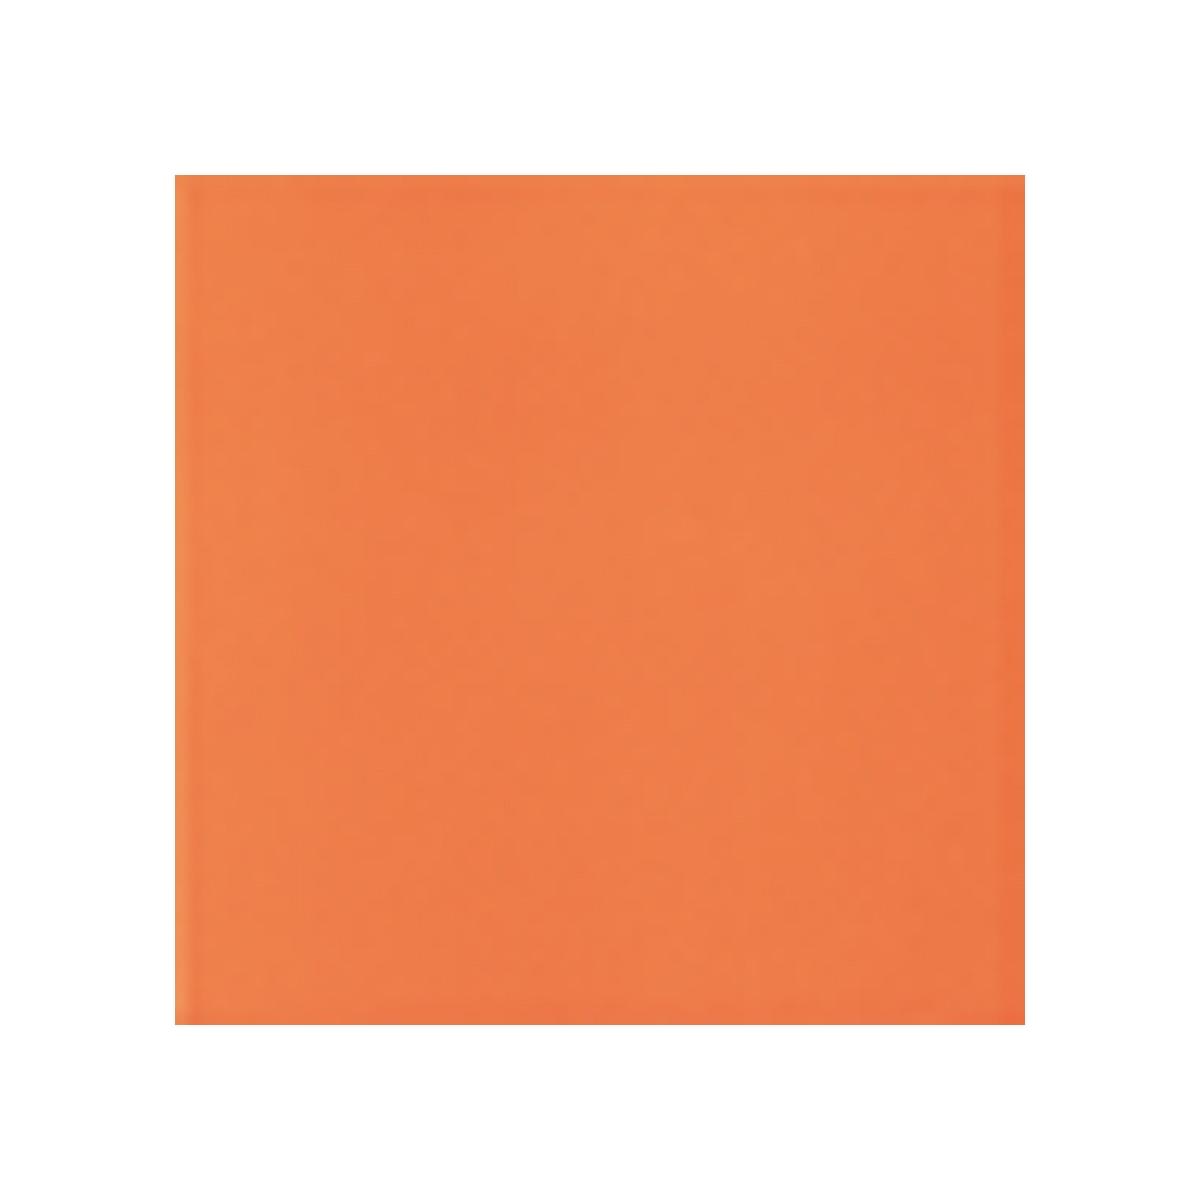 Color naranja mate - Colección Colores Mate - Marca Mainzu